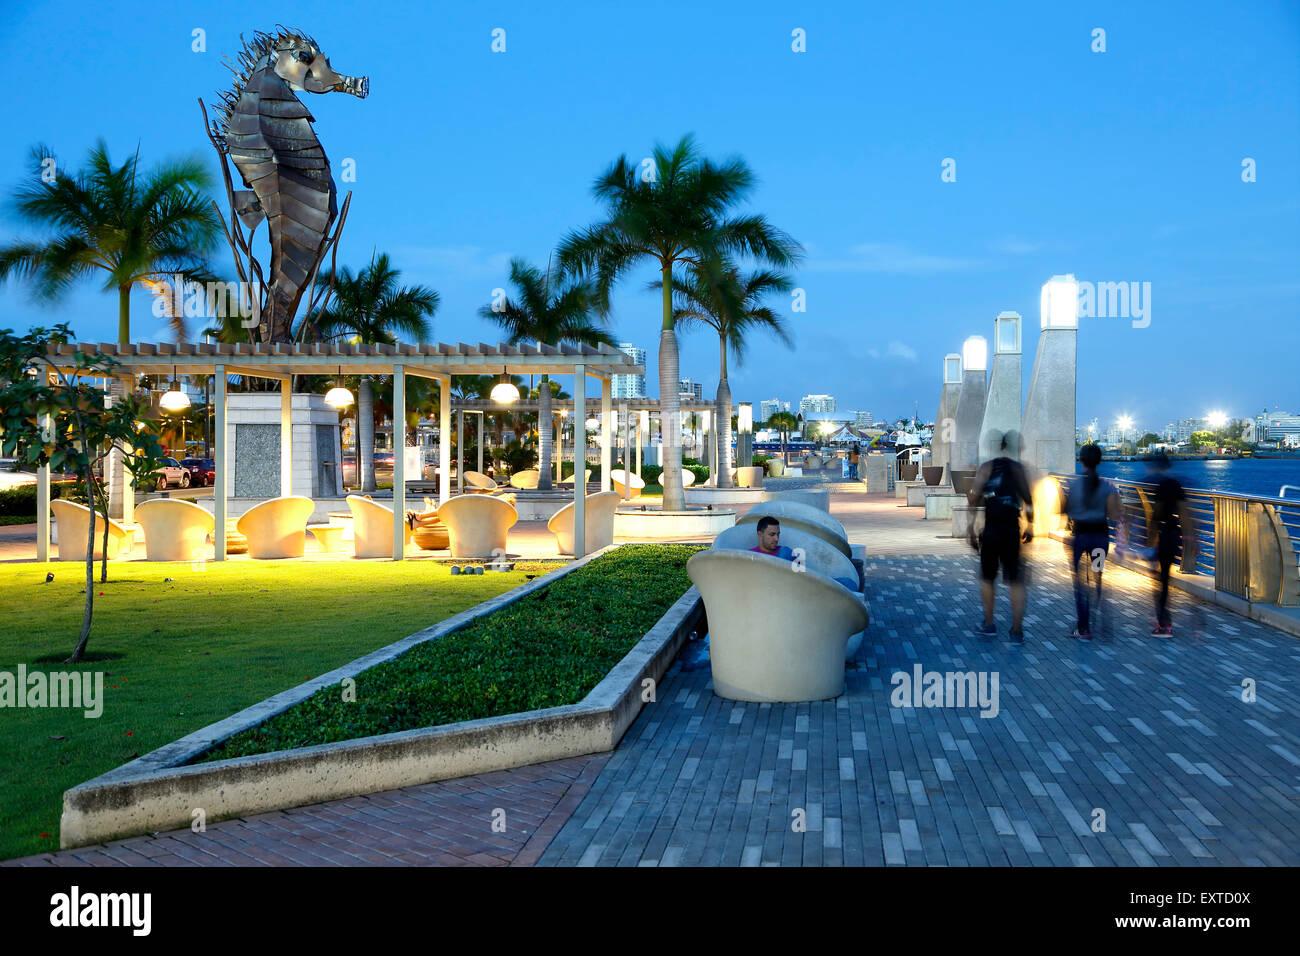 Seahorse sculpture and malecon (walkway), Bahia Urbana (Urban Bay), Old San Juan, Puerto Rico - Stock Image